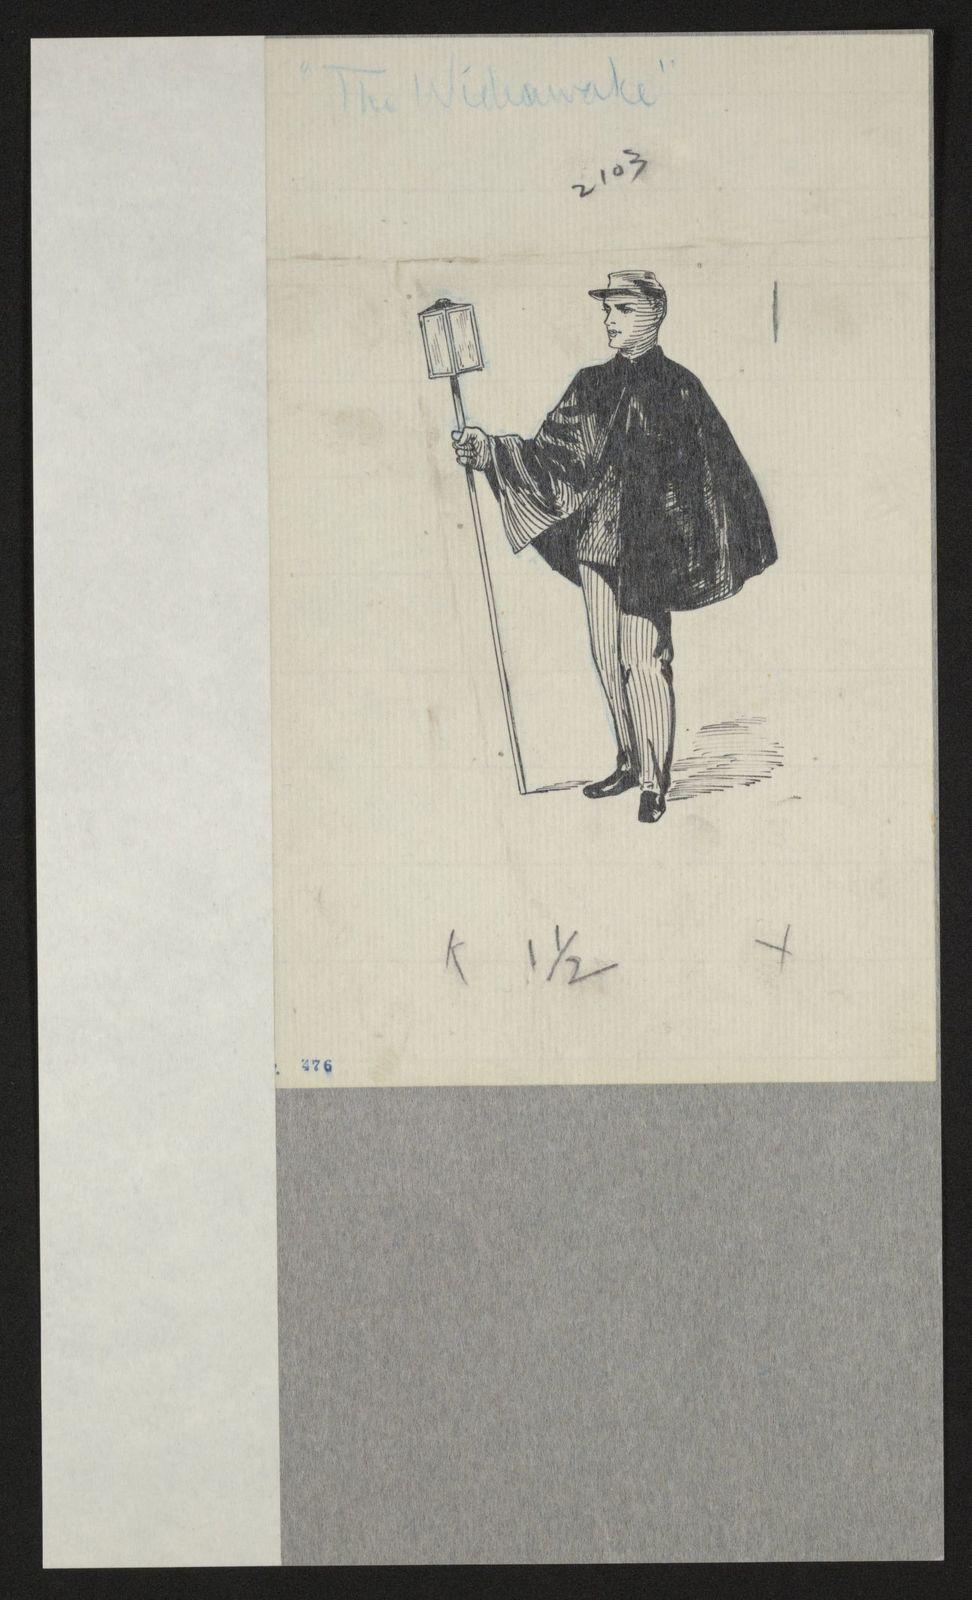 Charles Wellington Reed Papers: Sketchbooks, 1863-1887, undated; Unnumbered, leaves 416-650